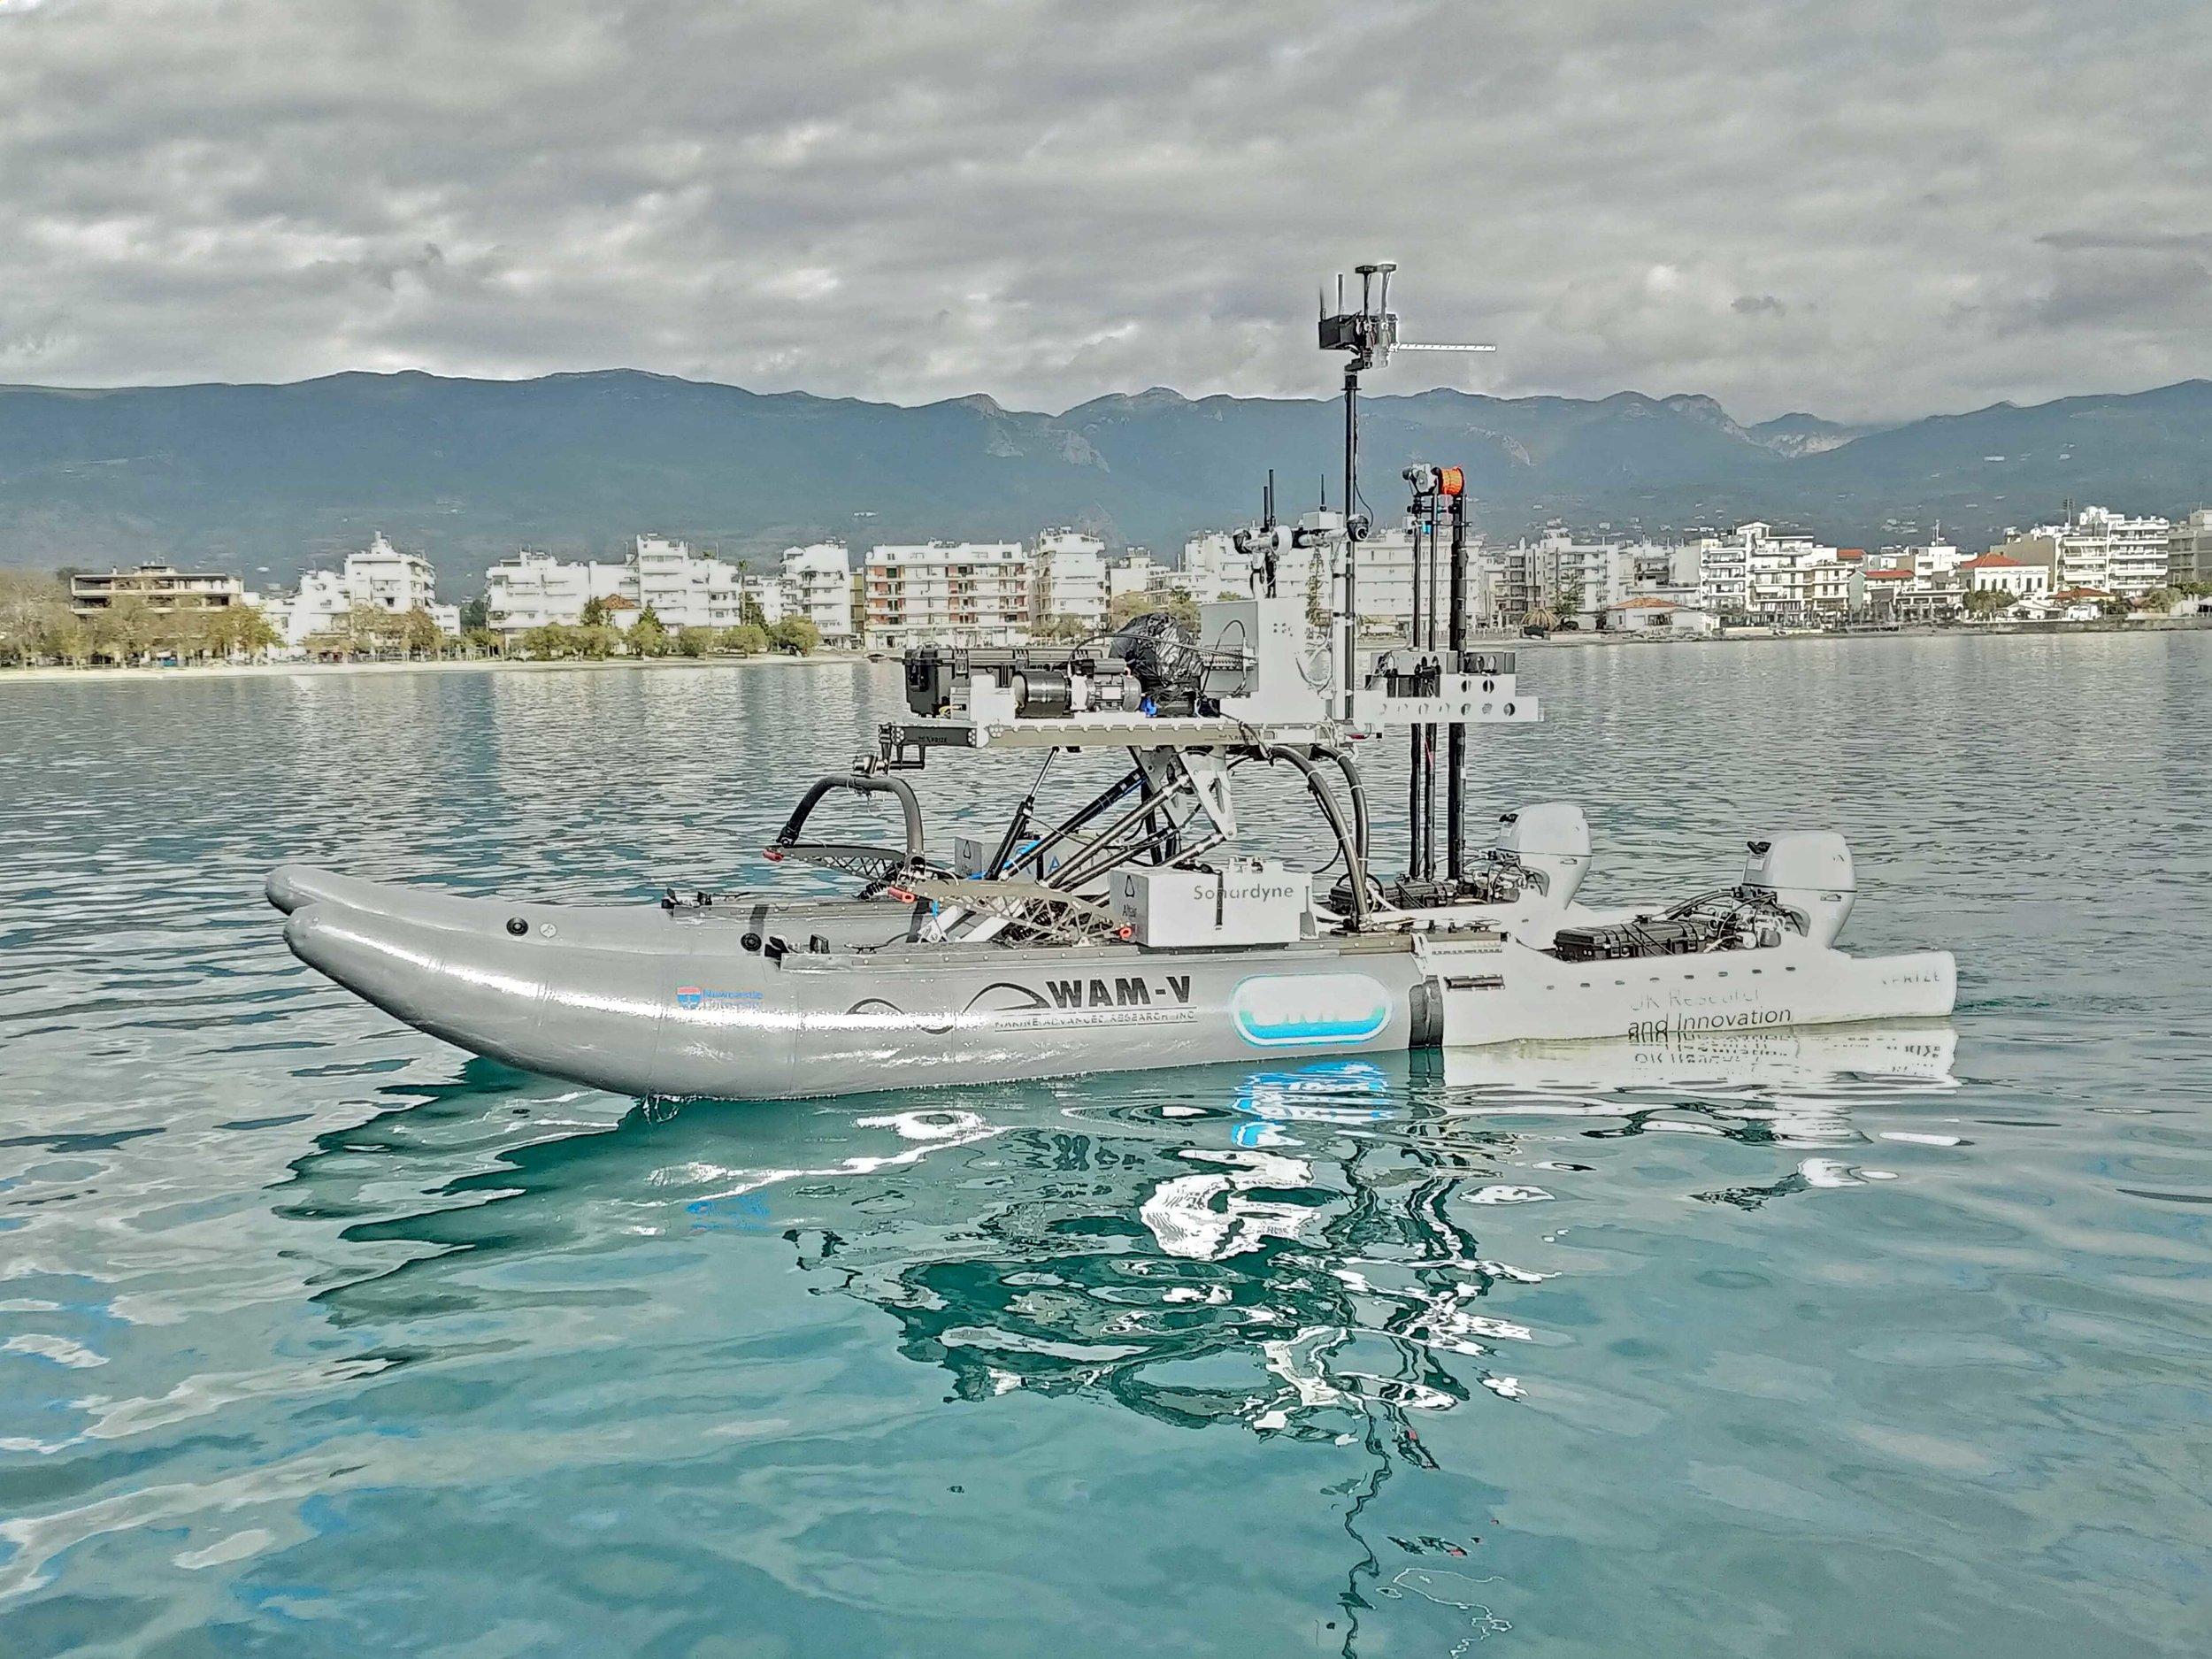 WAM-V 20 ASV Multi-Domain Autonomous Marine System